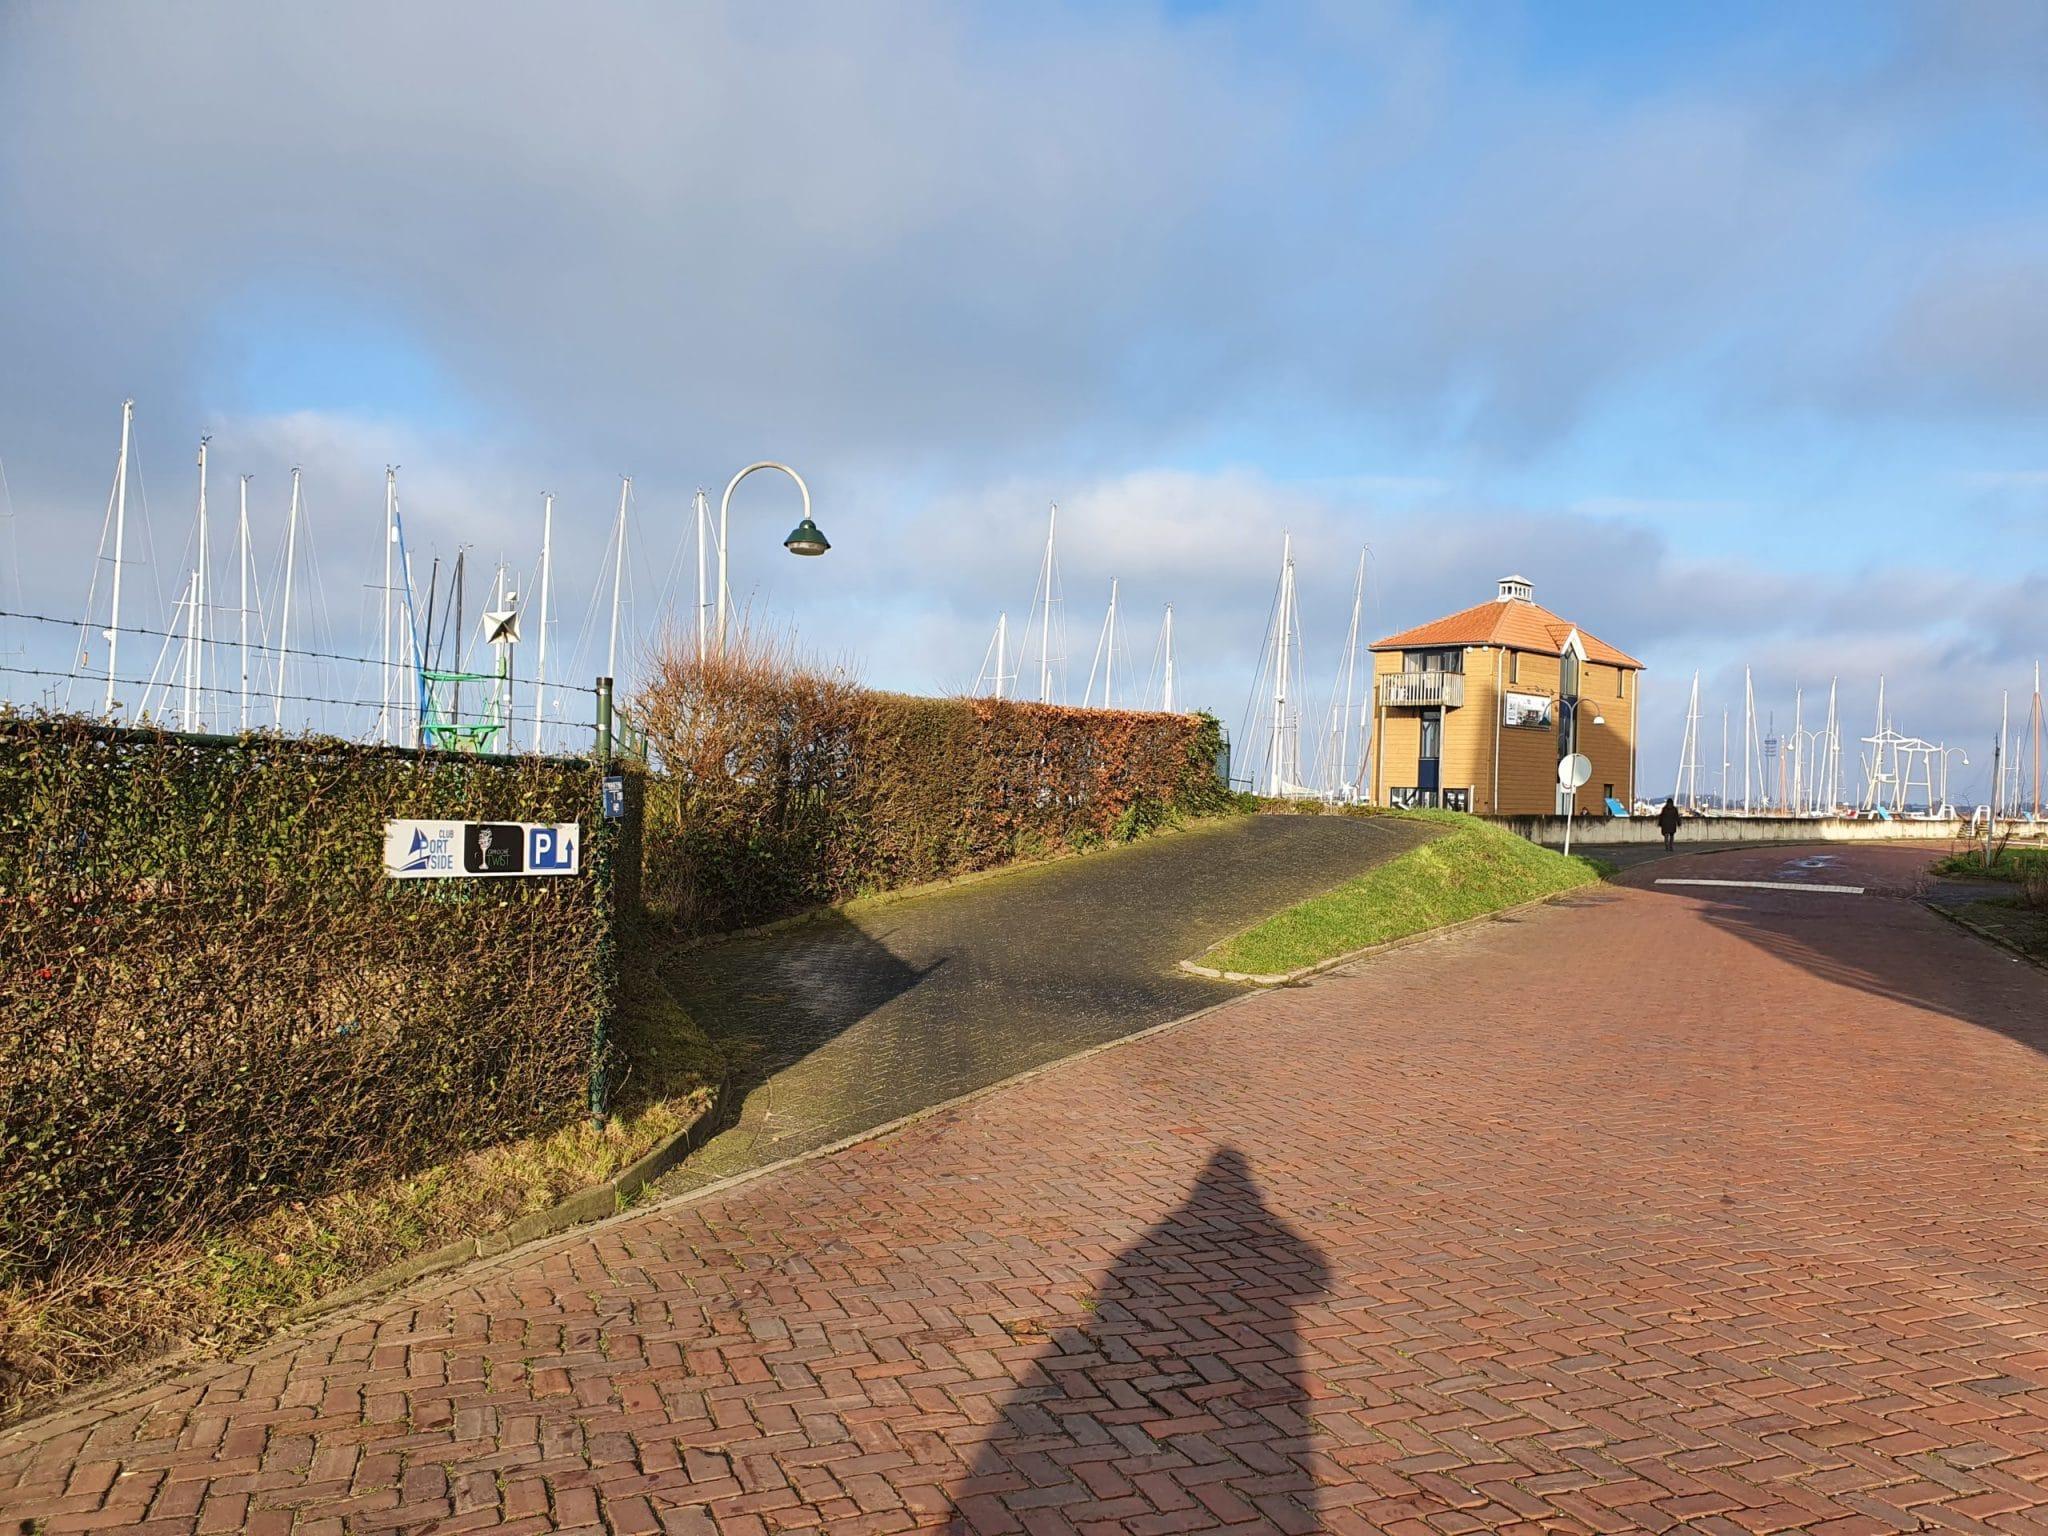 Lelstad-Zufahrt-PP-Hausboote